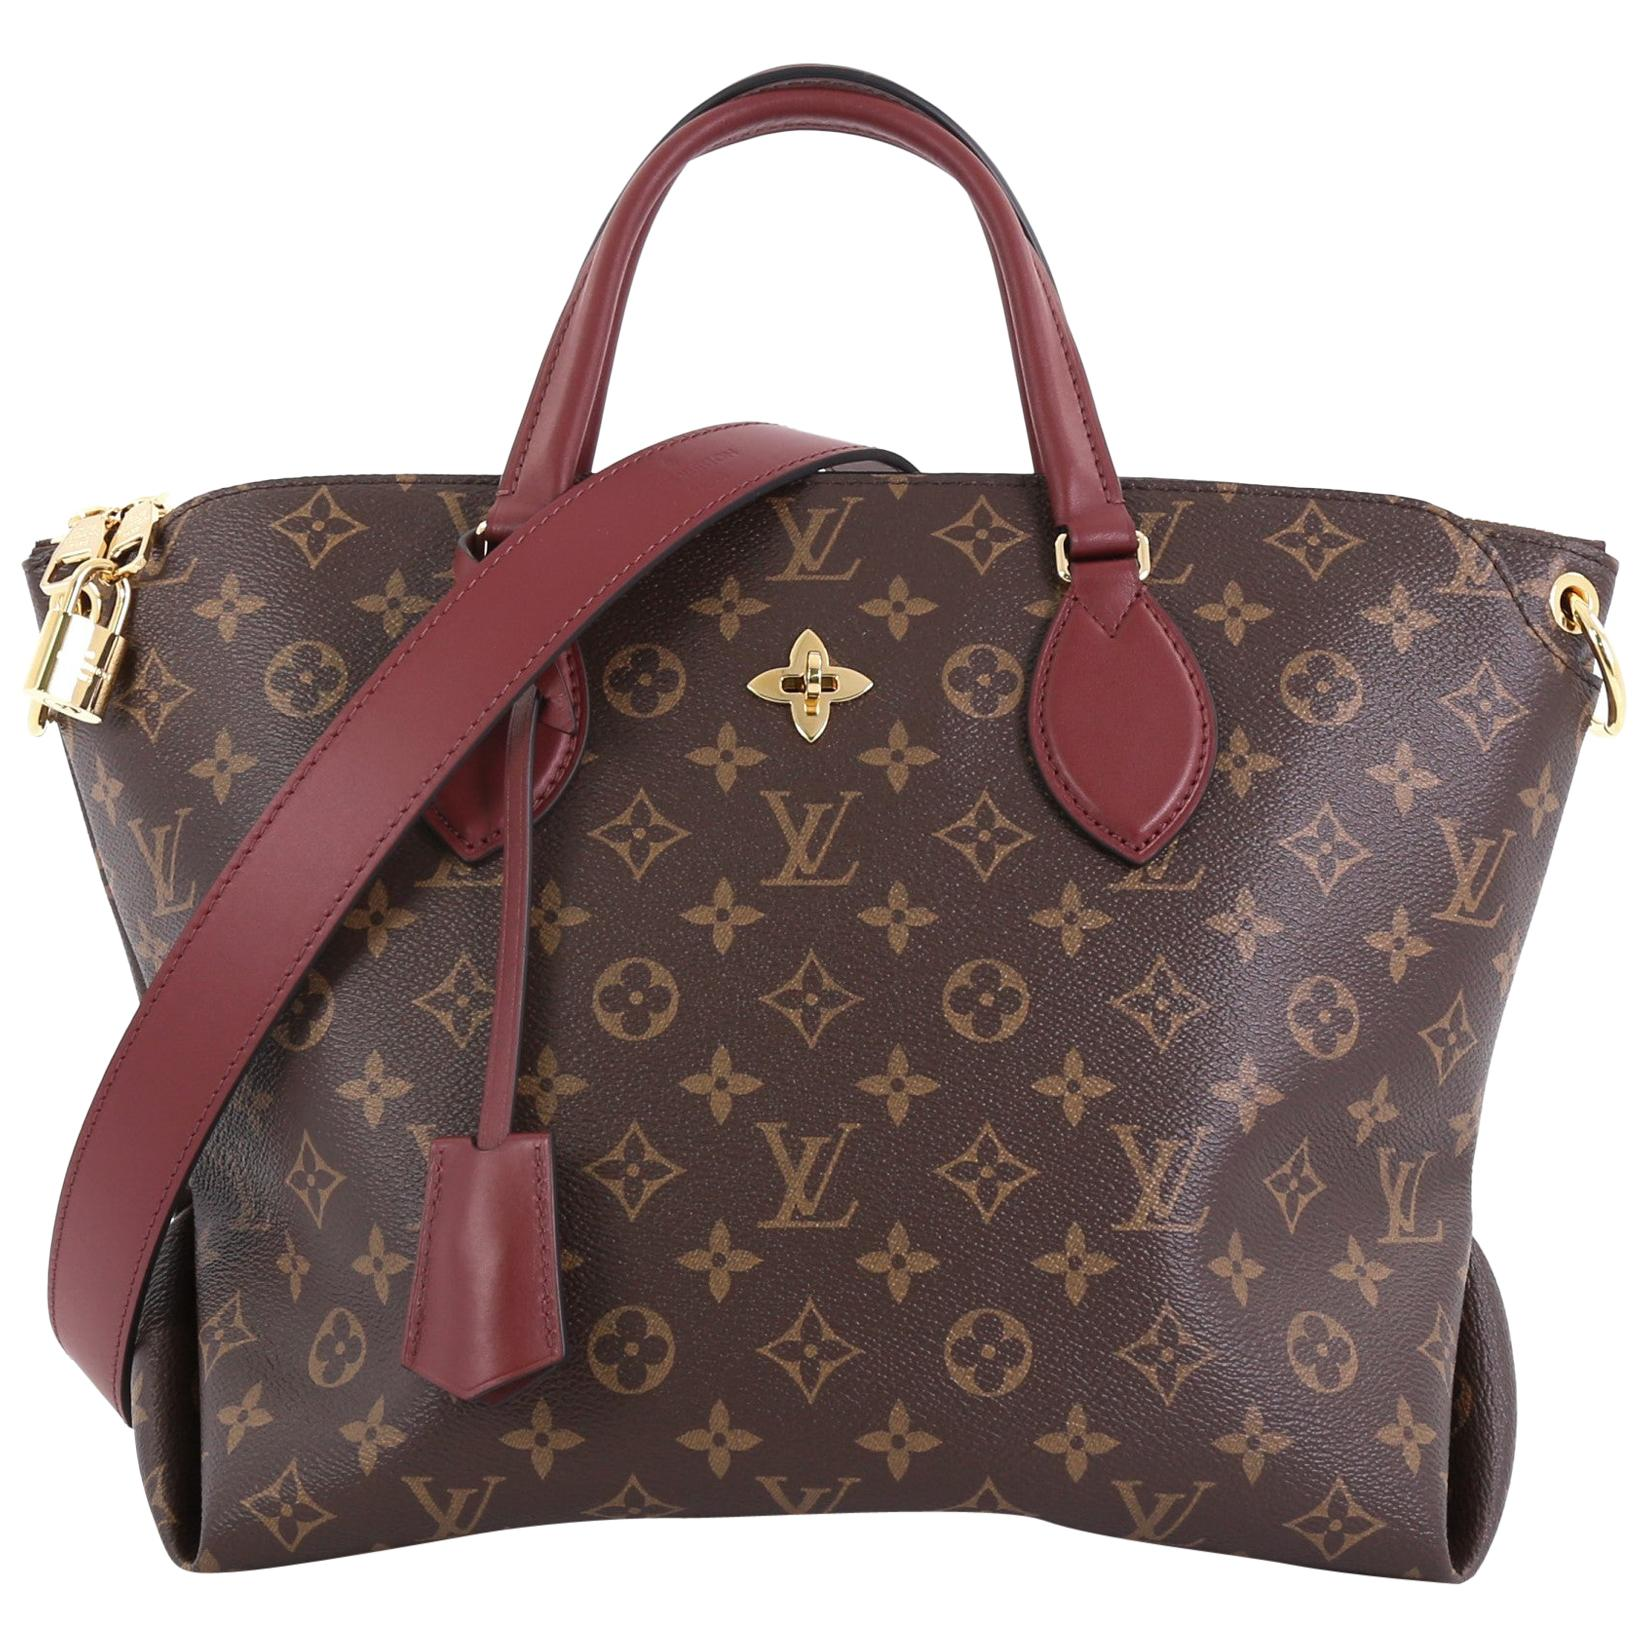 cb08a68ad23c5 Rebag Handbags and Purses - 1stdibs - Page 20